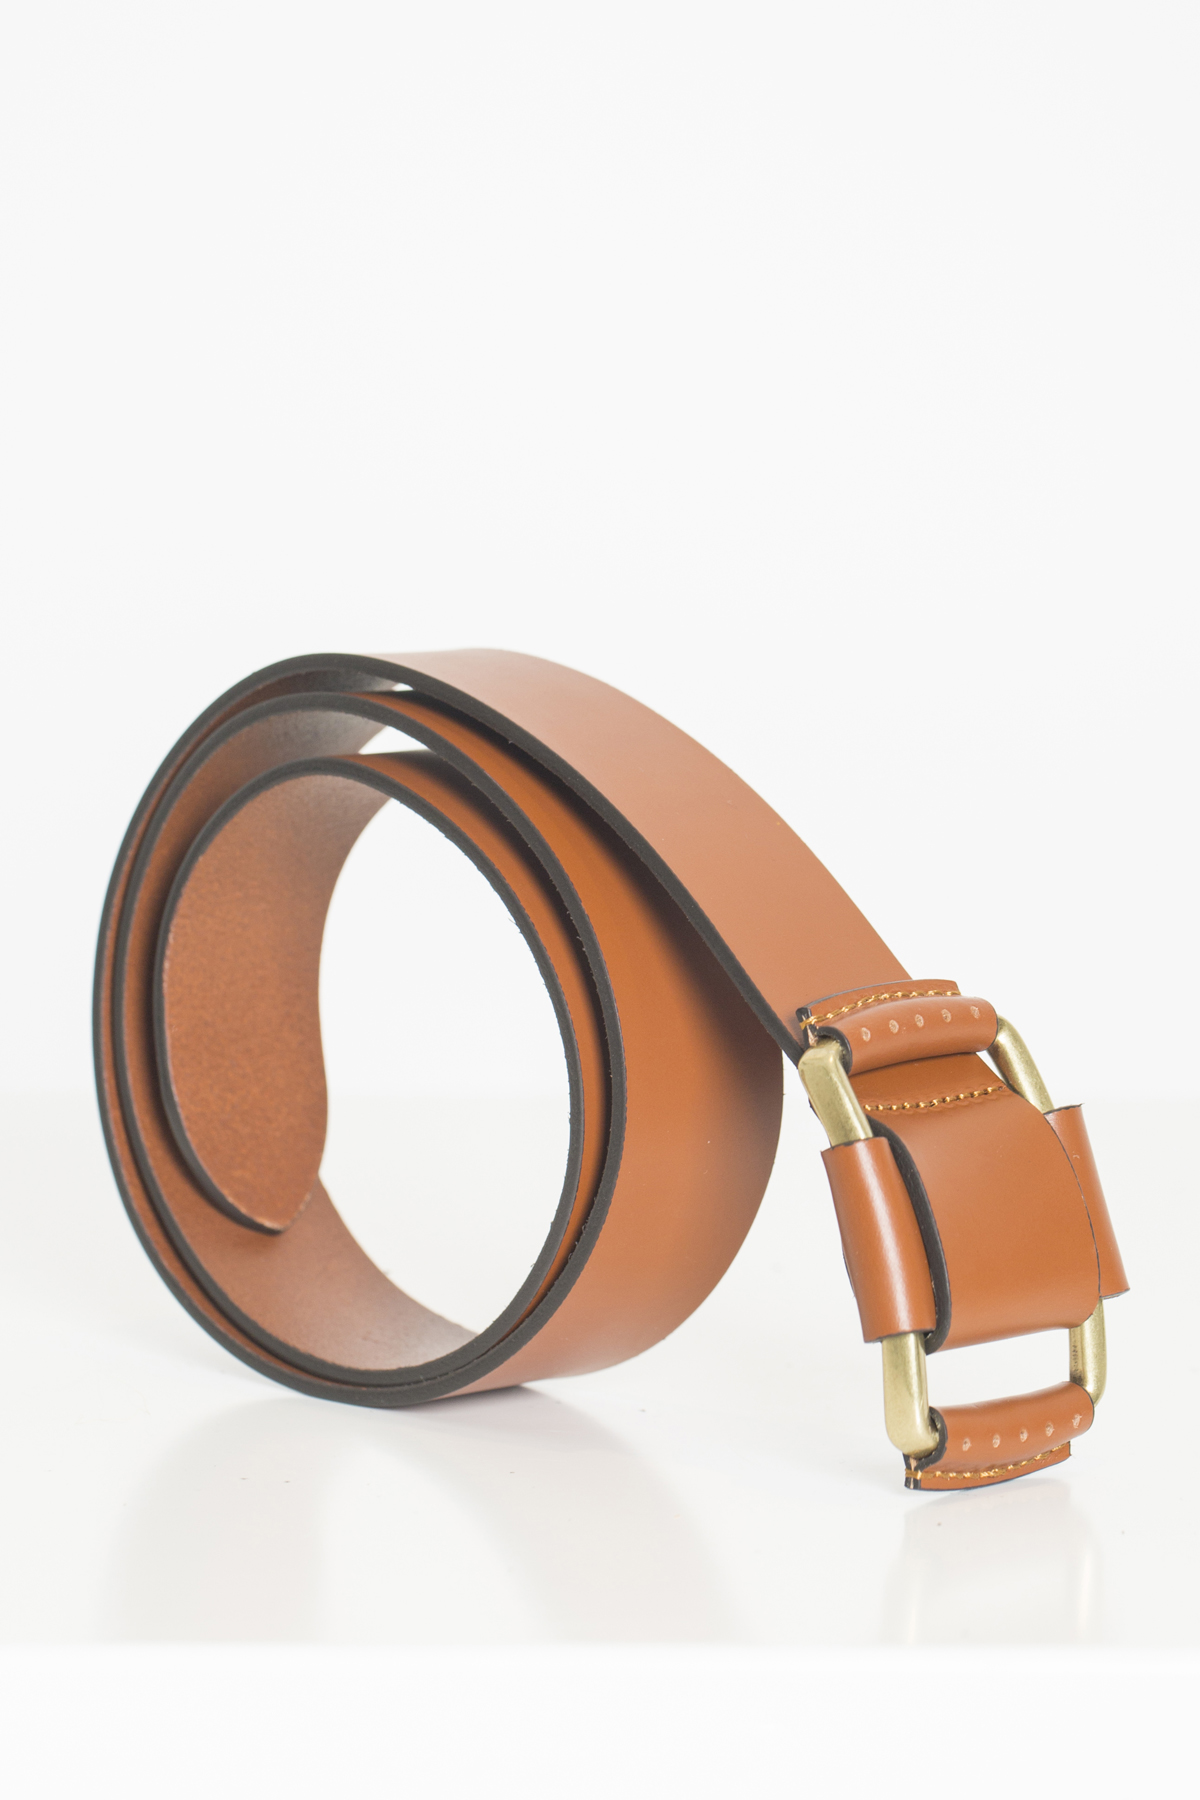 giulio-roux-belt-leather-sessun-matchboxathens